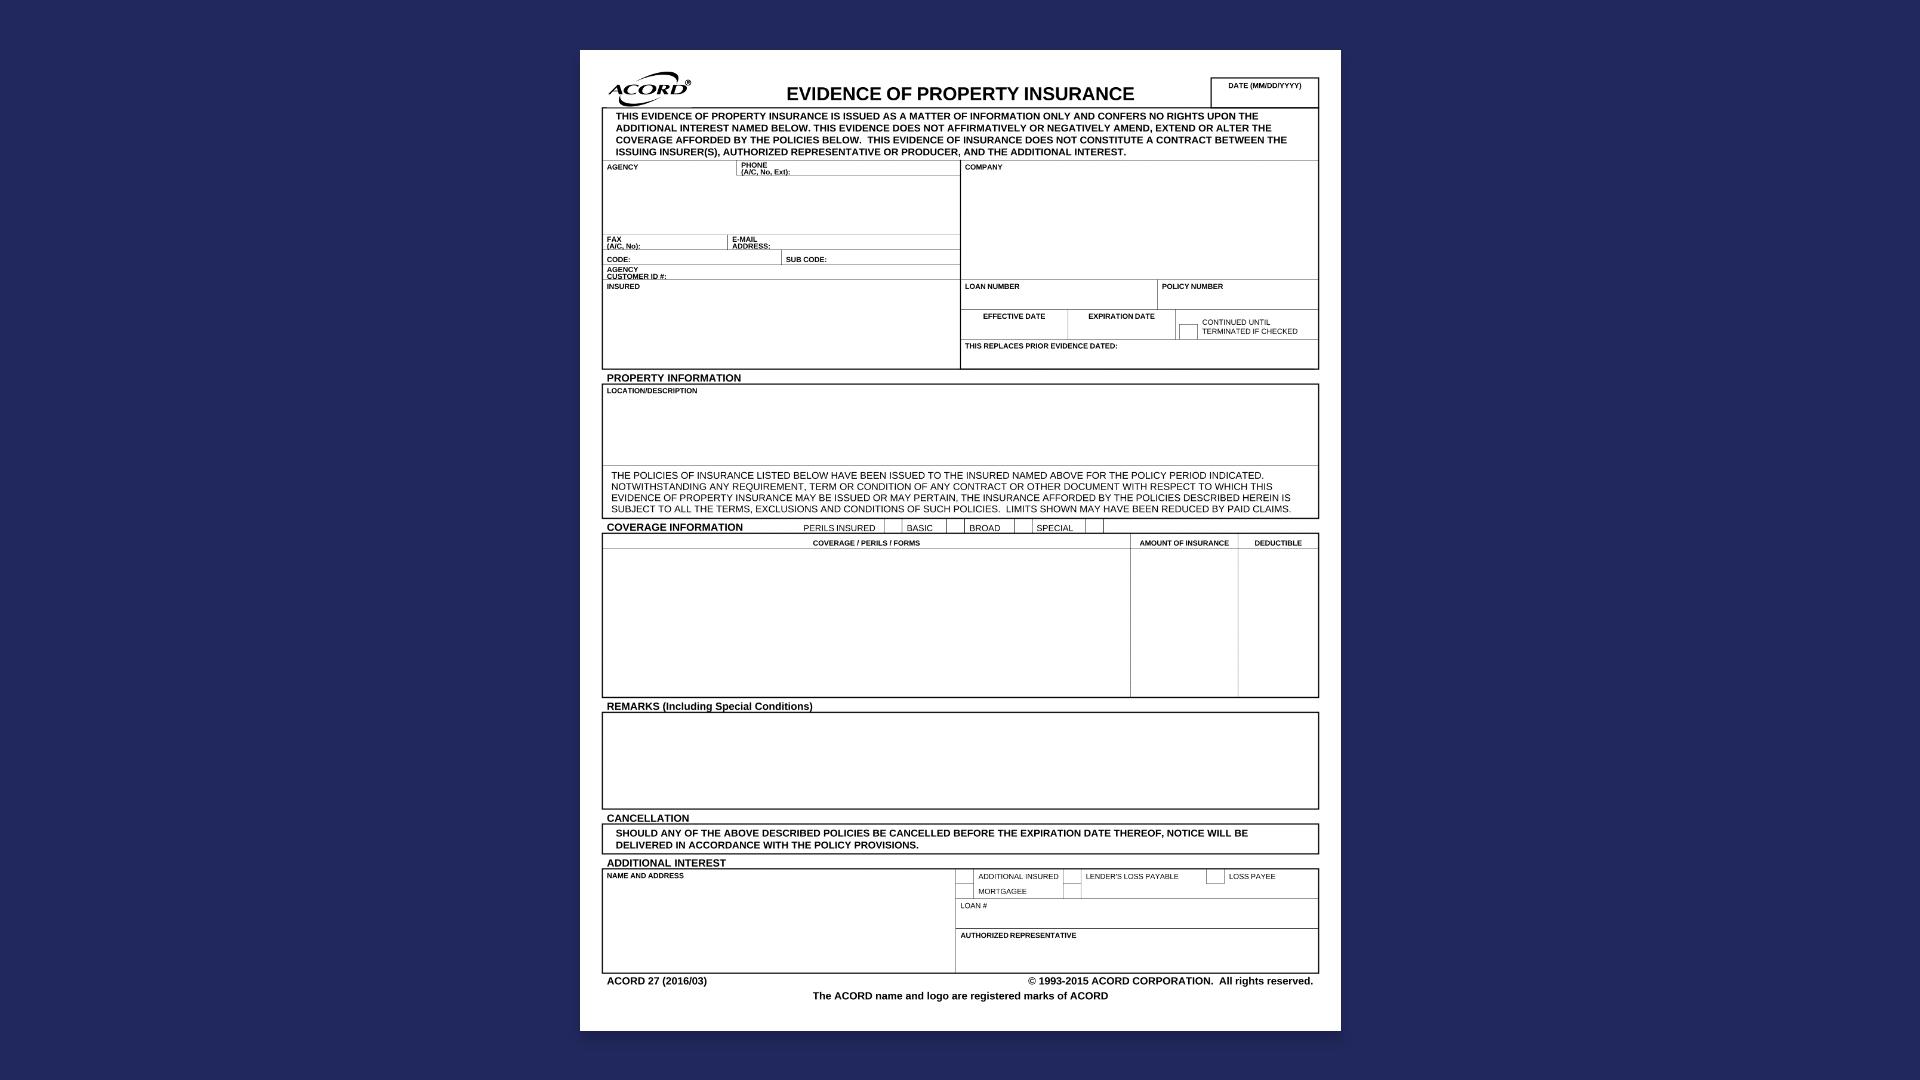 Sample Acord Form 27